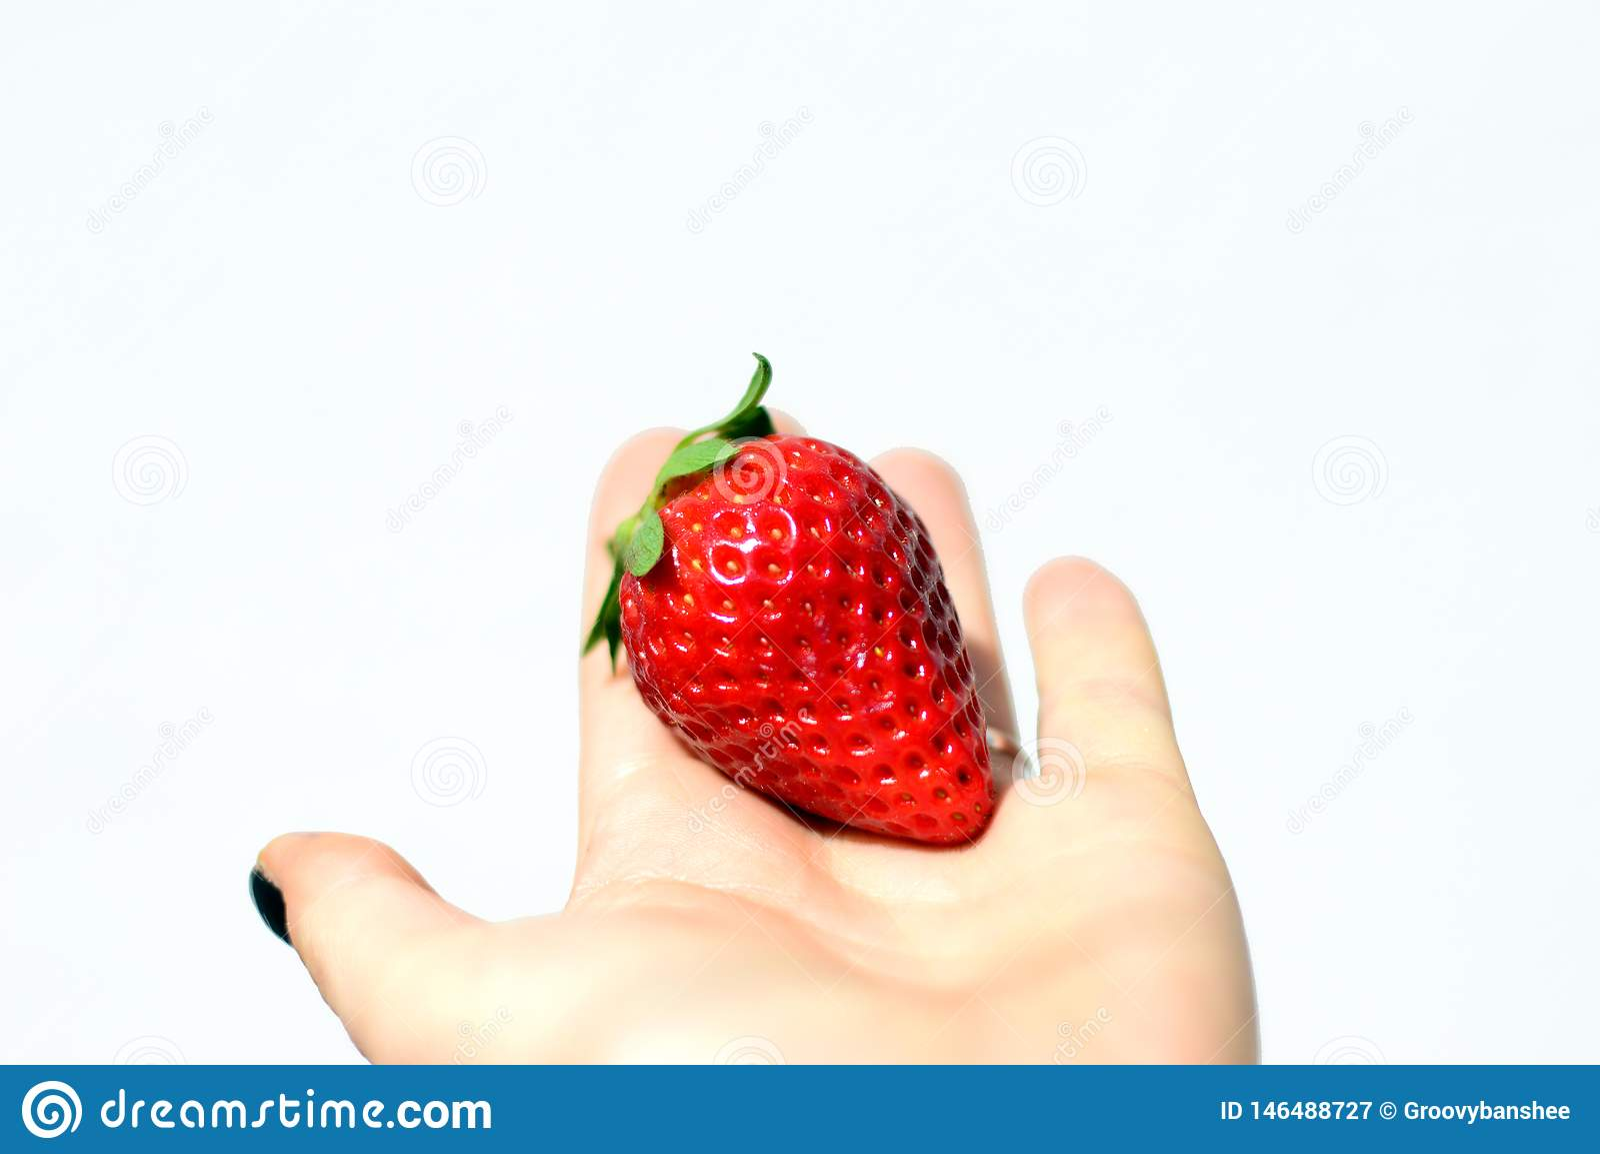 Tasty strawberries isolated on white background